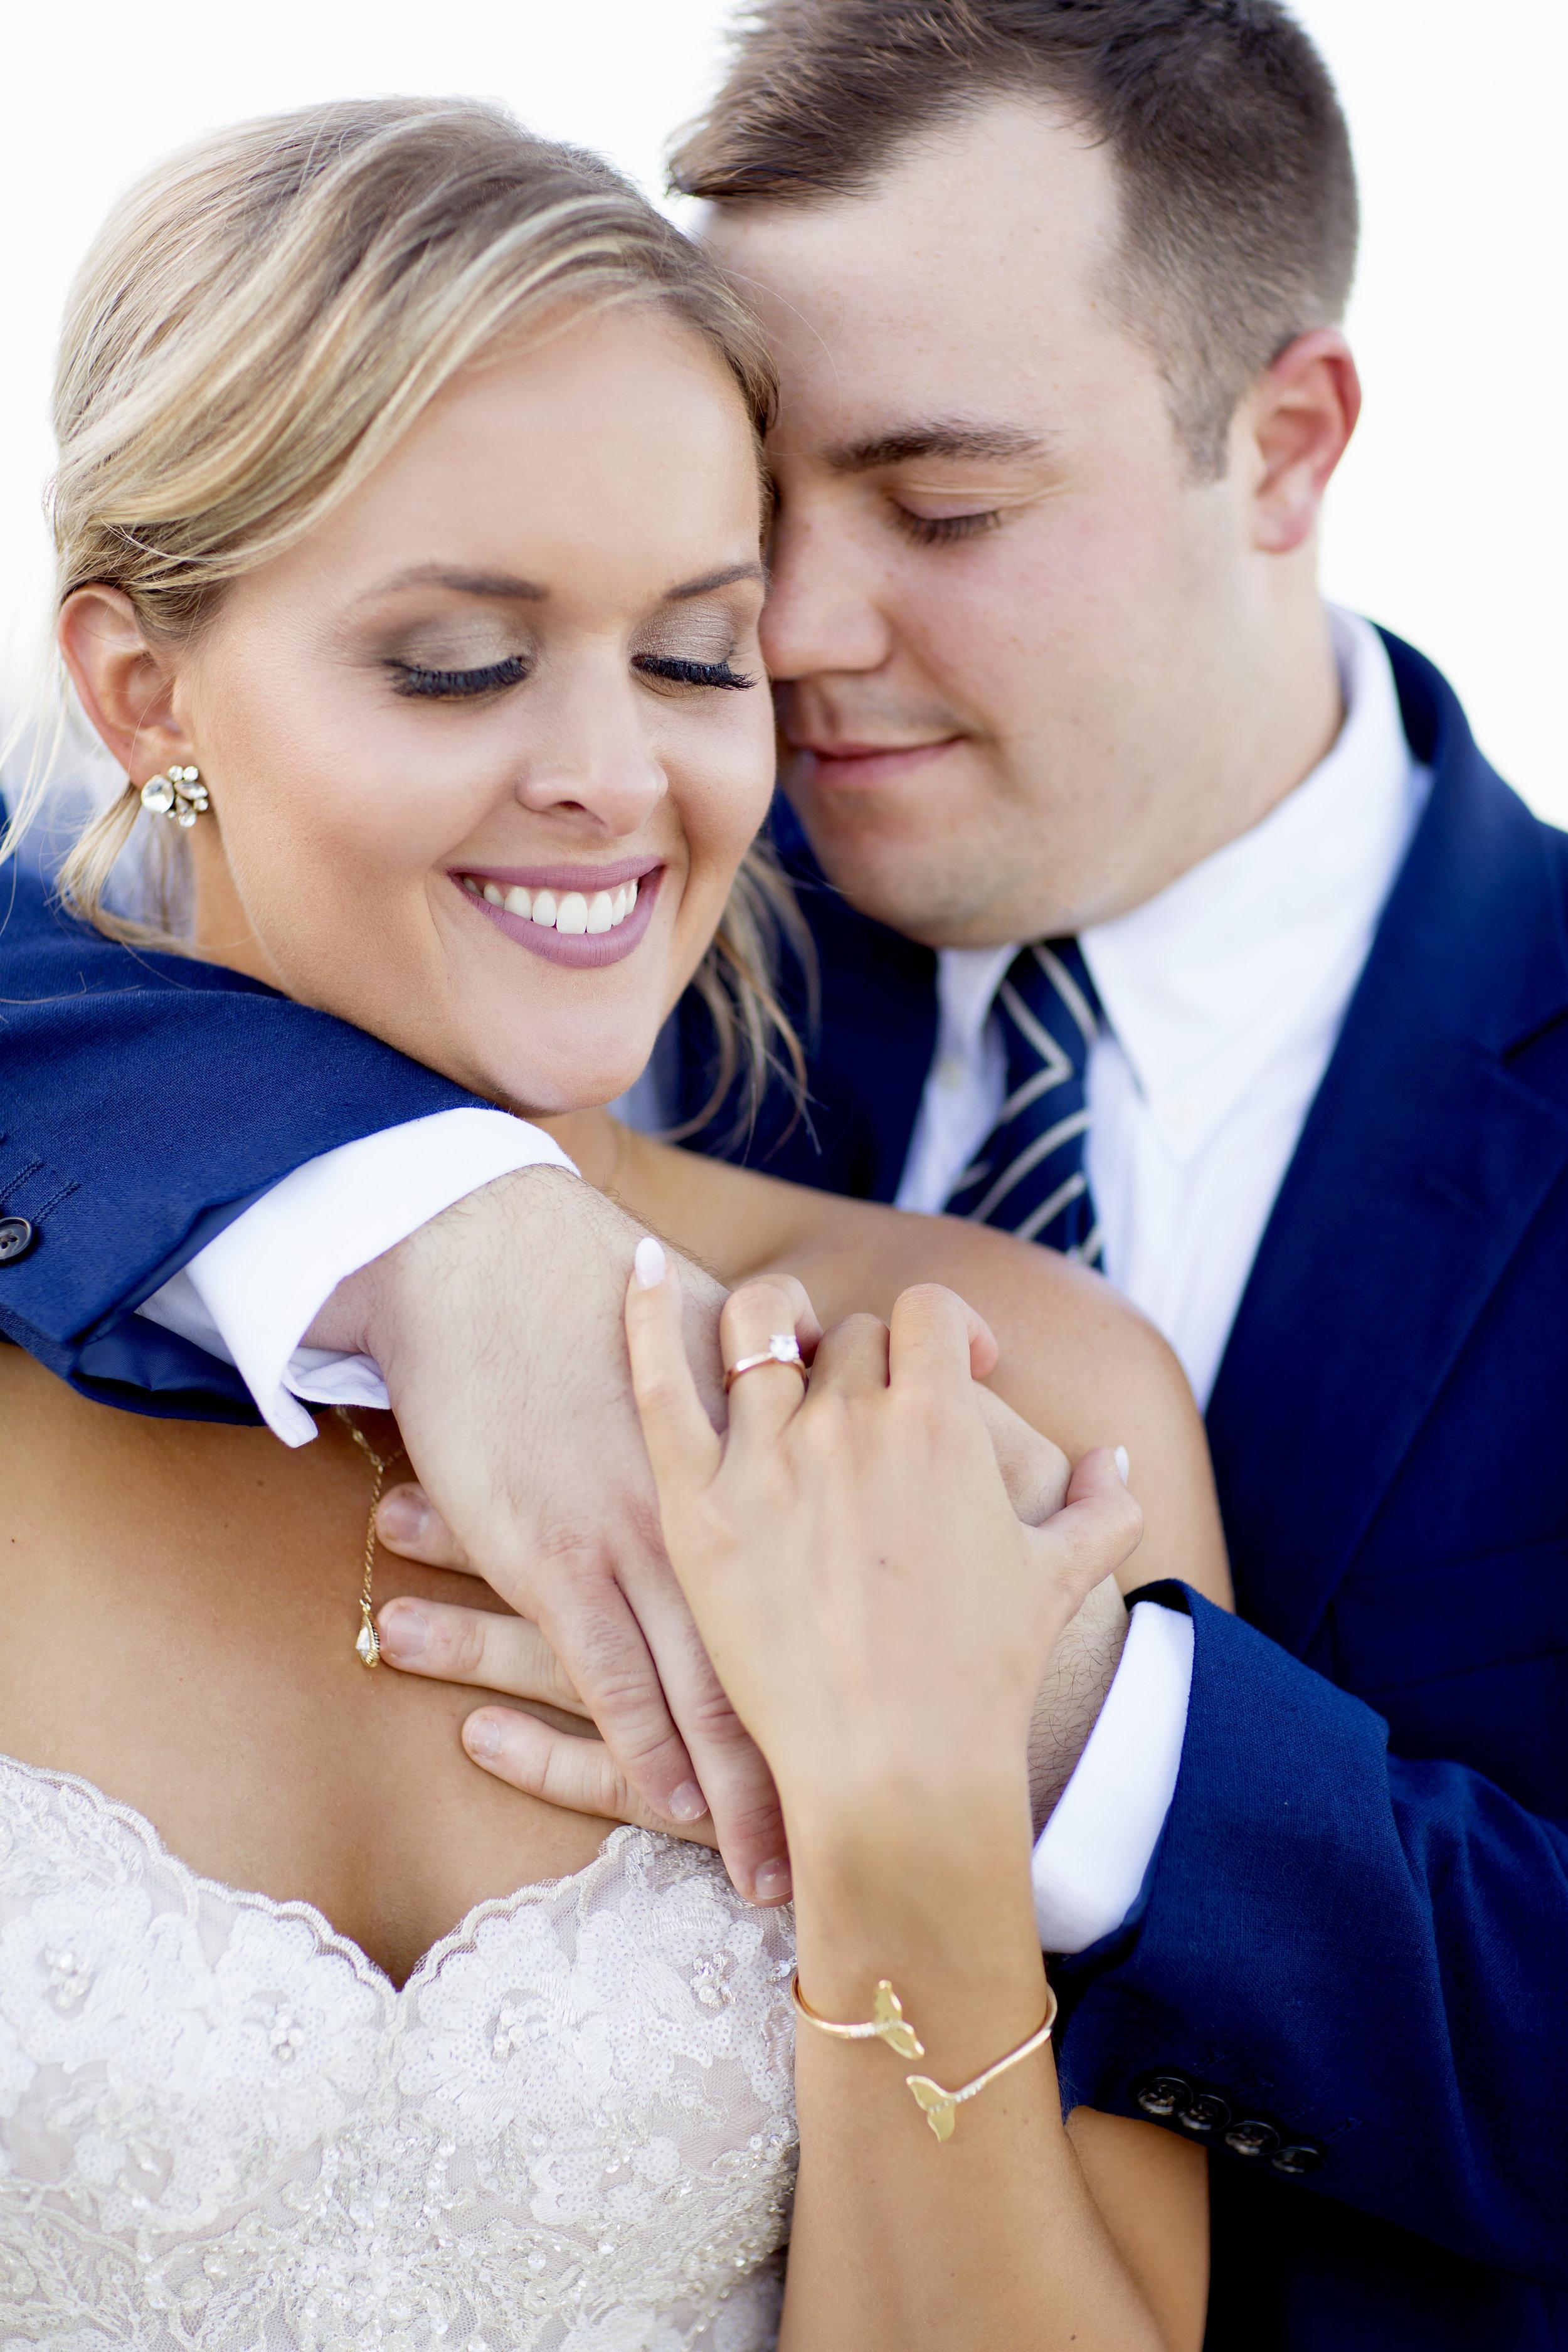 20170827_carroll_wedding_1020.jpg